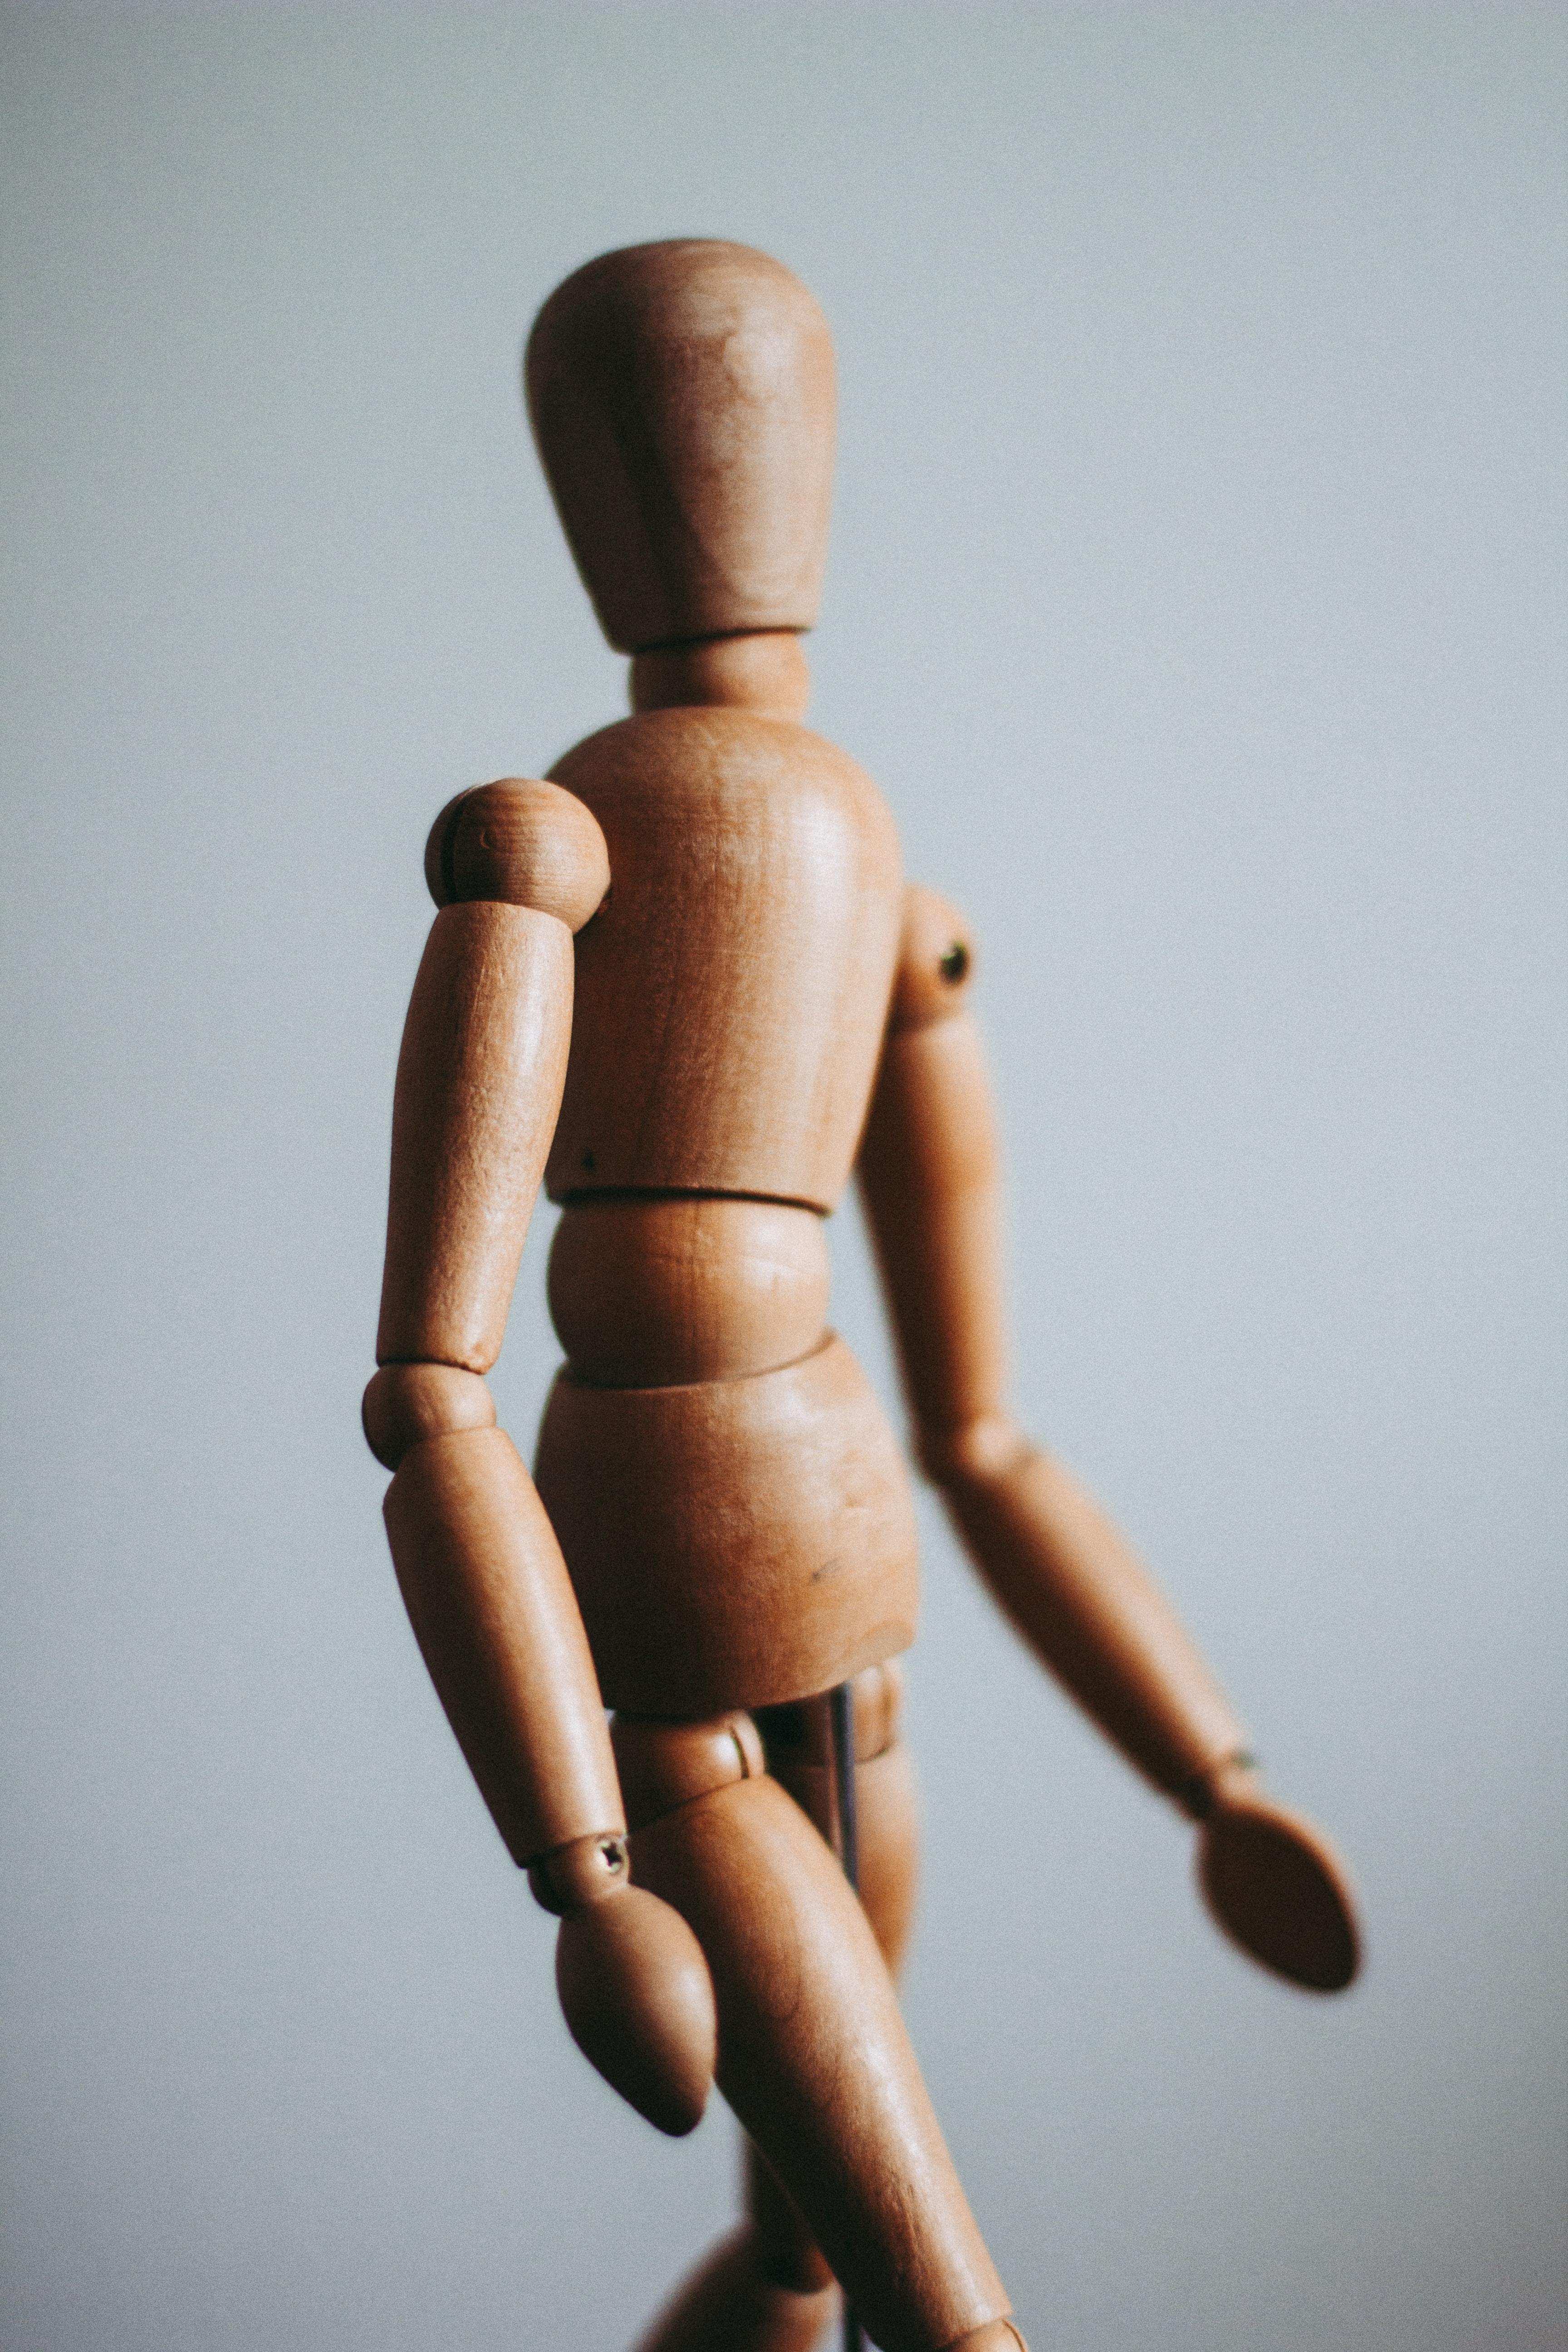 corps humain en bois